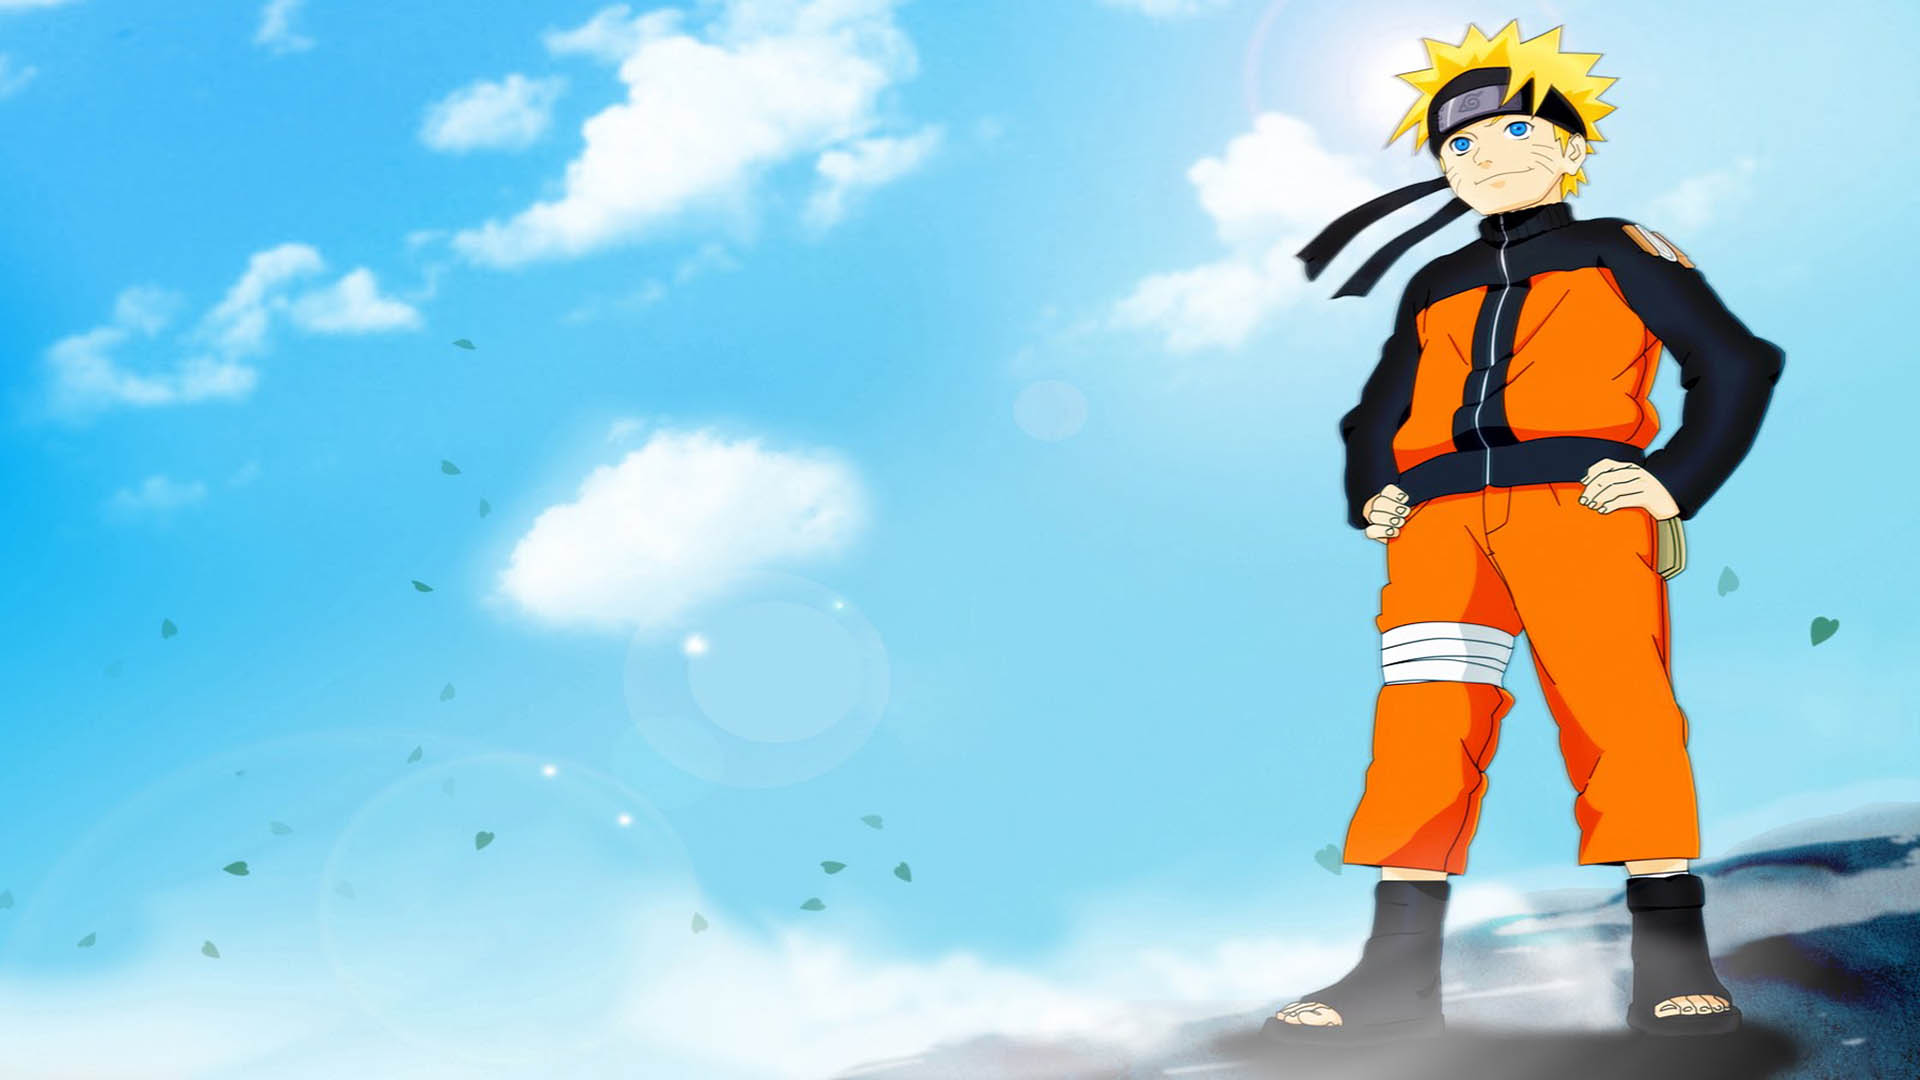 Hd Naruto Wallpapers Wallpapersafari